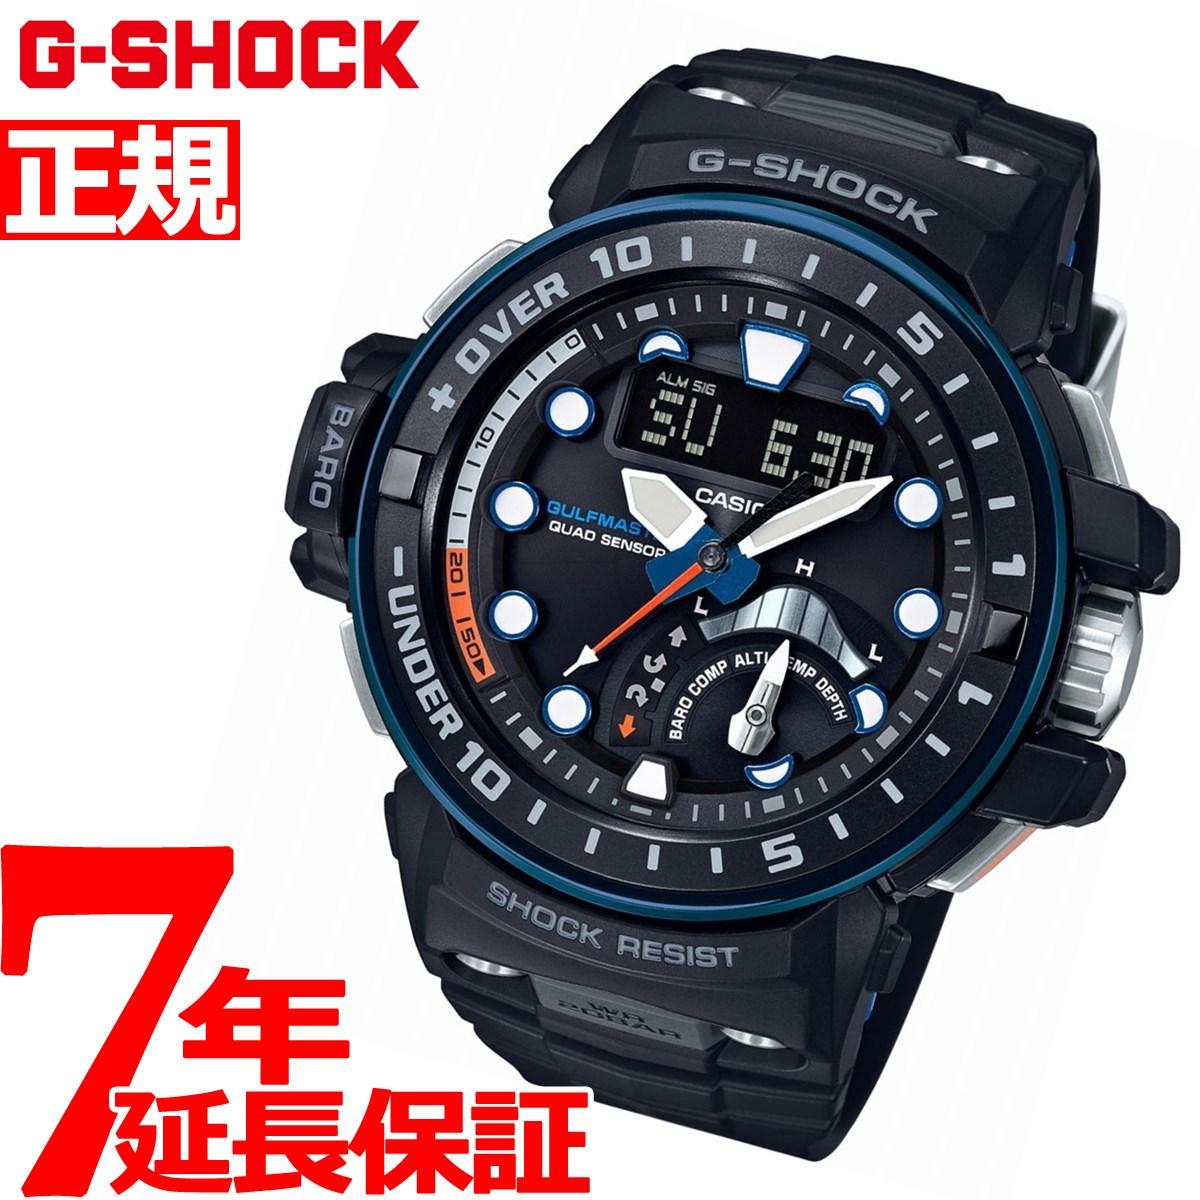 G-SHOCK 電波 ソーラー 電波時計 カシオ Gショック ガルフマスター CASIO GULFMASTER 腕時計 メンズ アナデジ GWN-Q1000A-1AJF